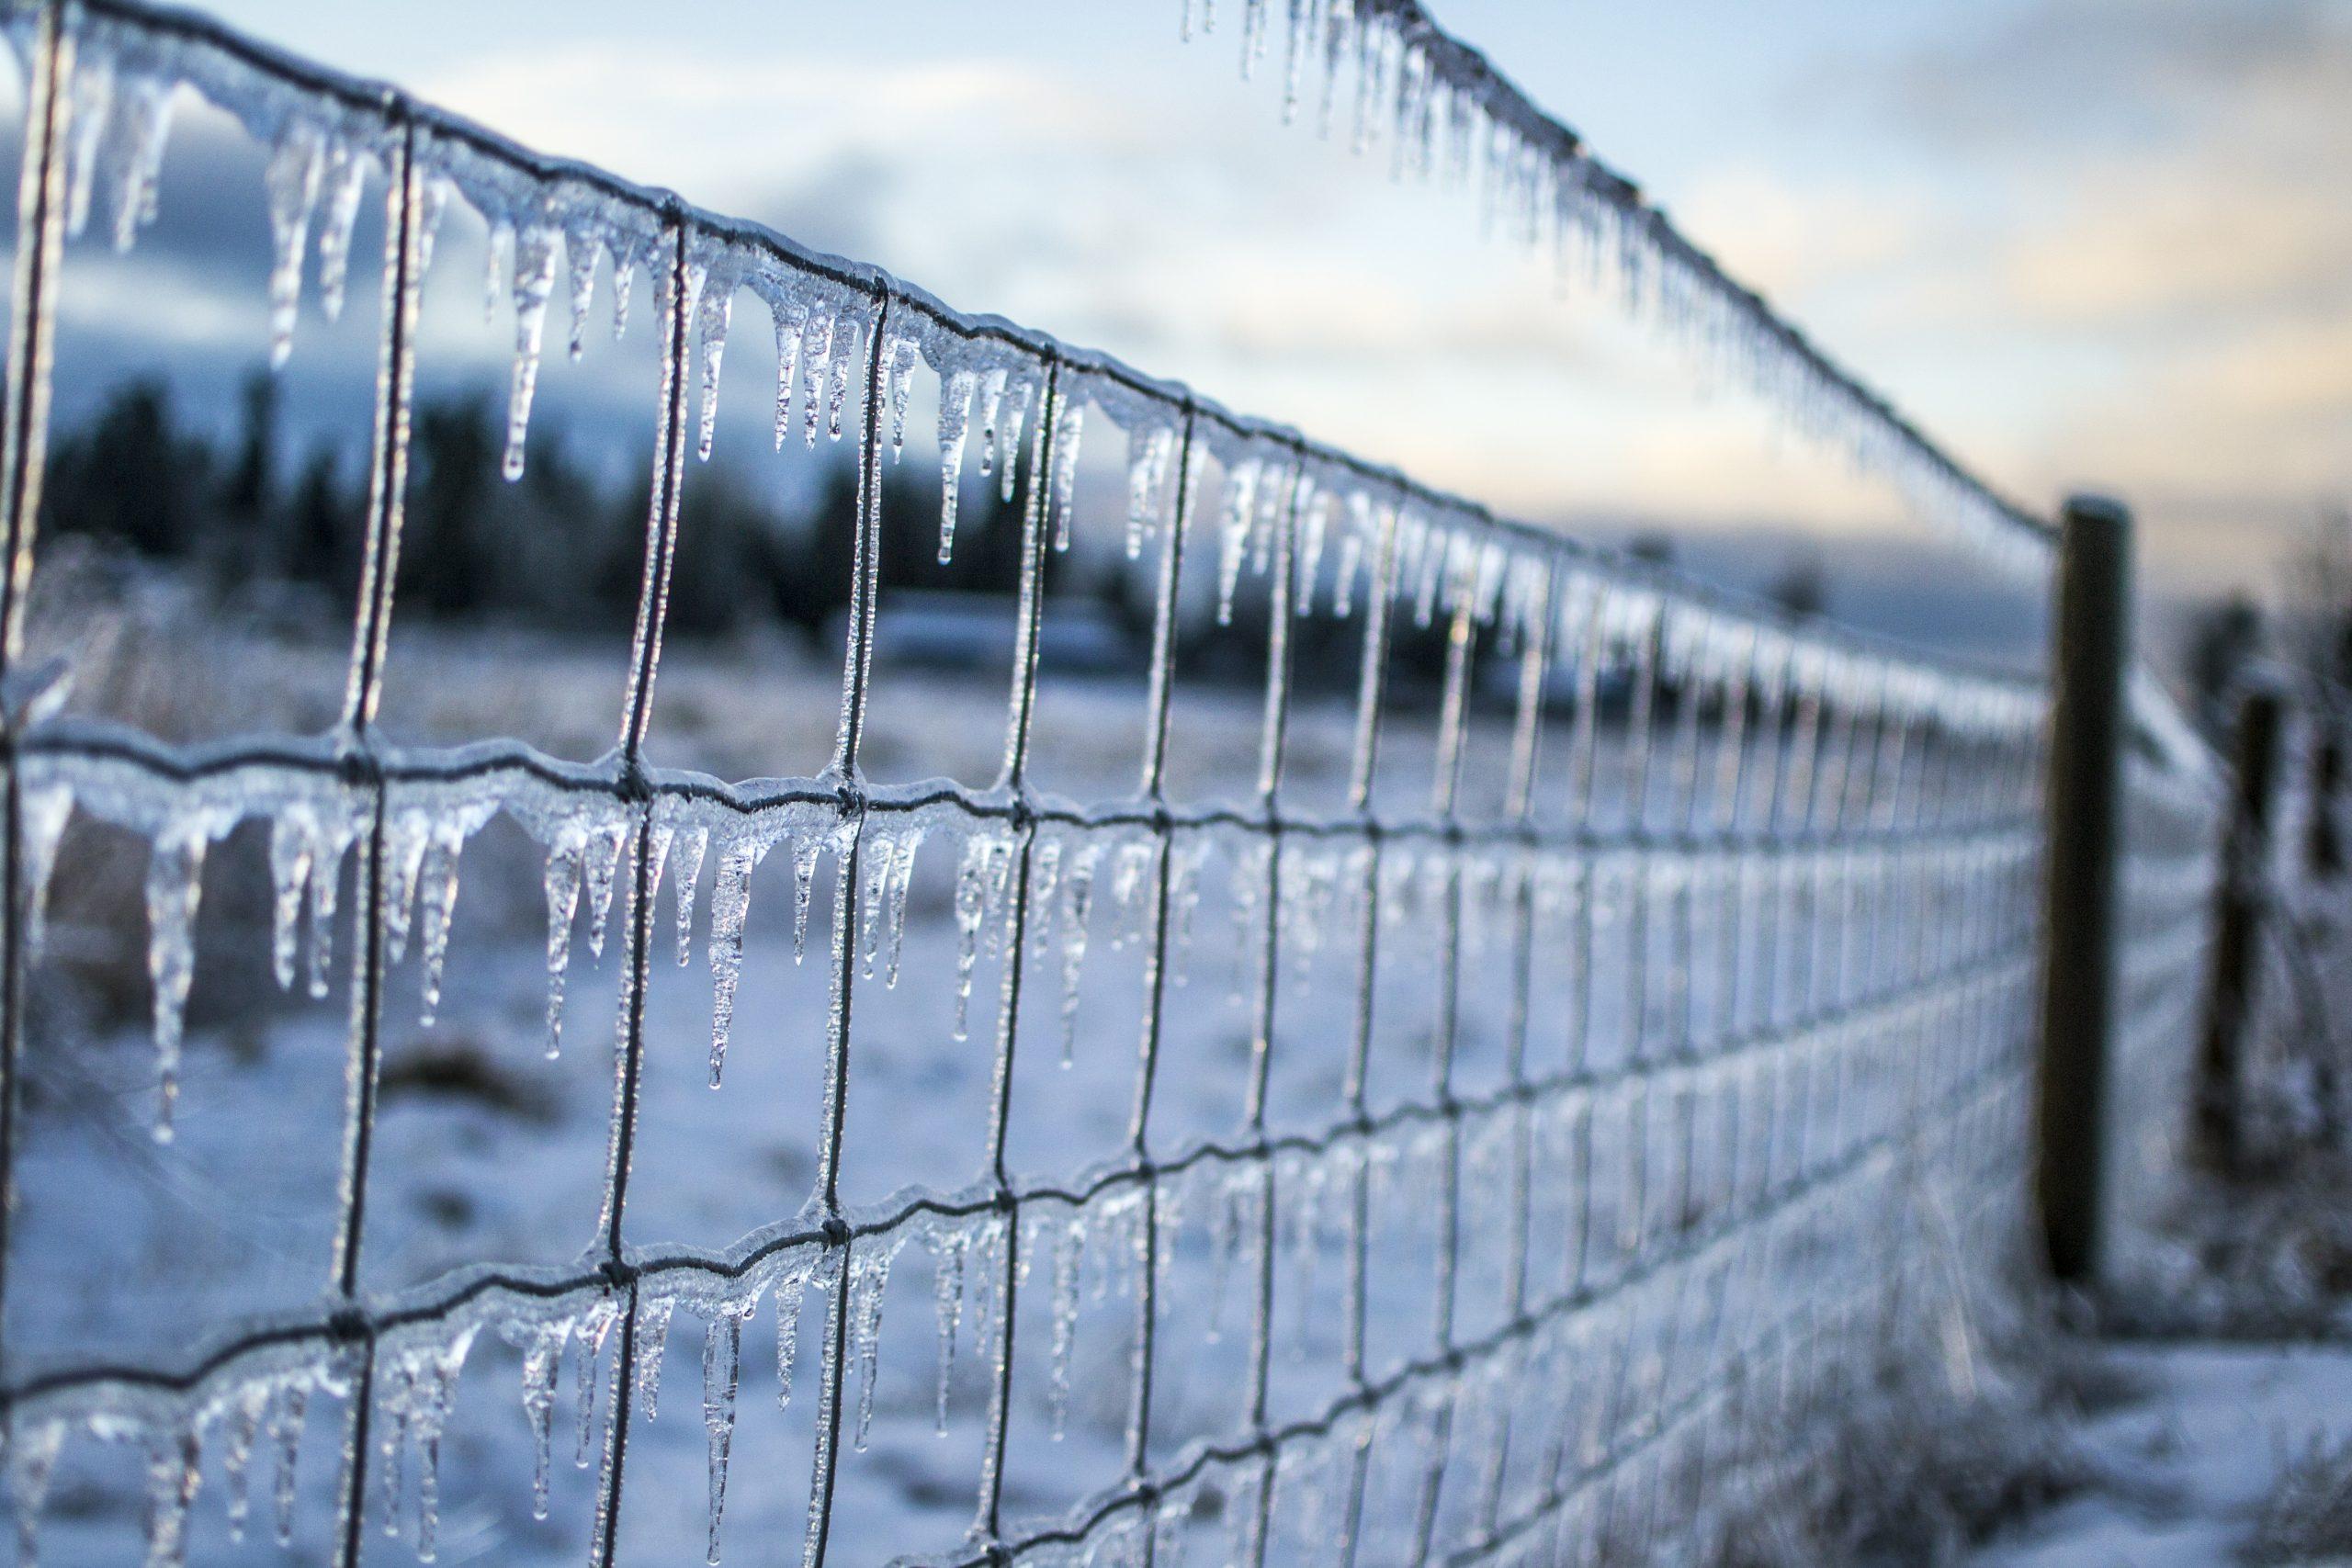 Ricerca, legame tra riscaldamento globale e freddo estremo